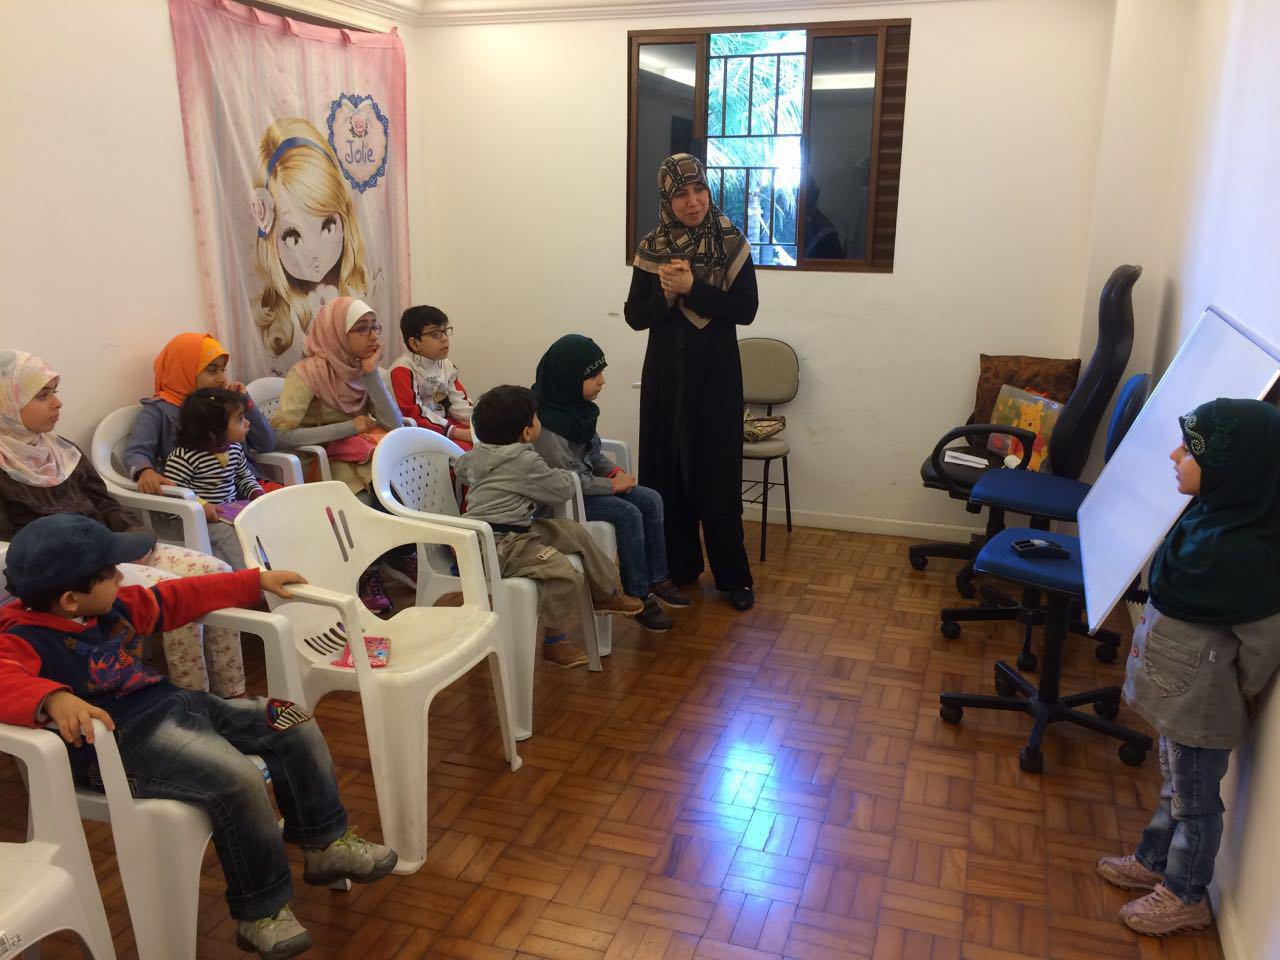 Centro islámico en Brasil organiza cursos de Corán para niños